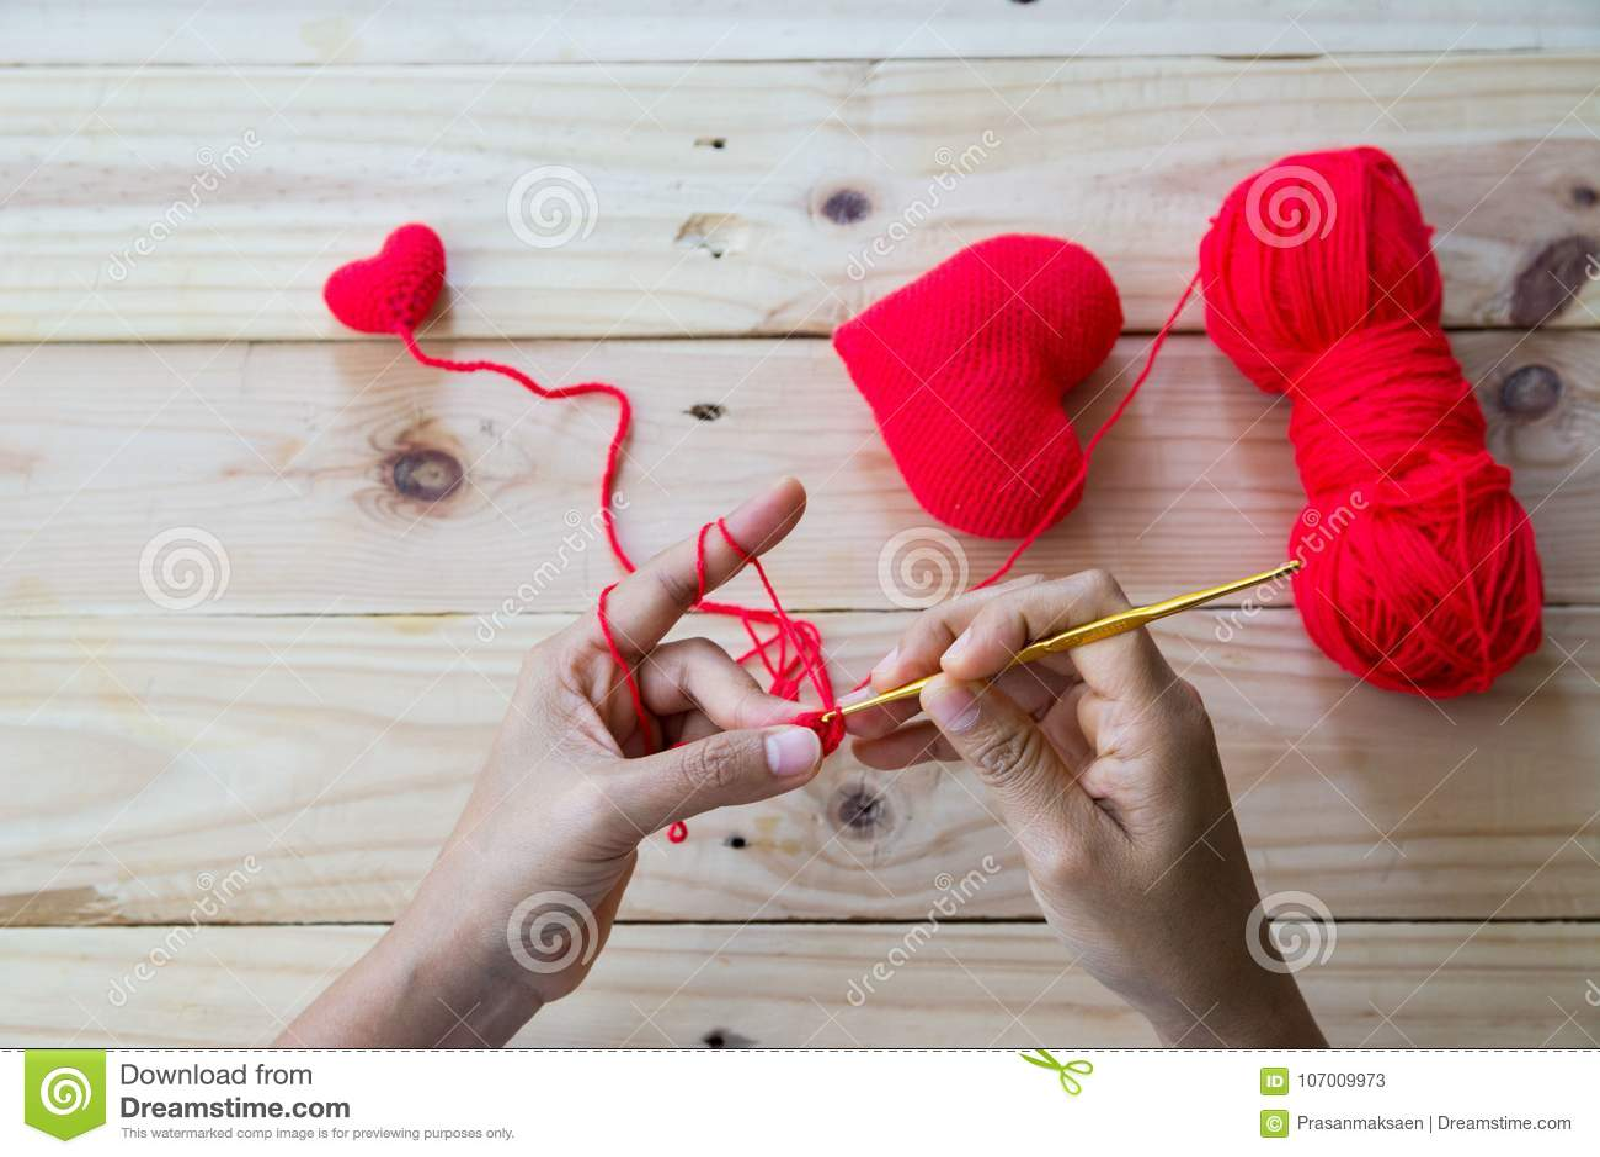 Handmade Crochet Red Heart Stock Image Image Of Handicrafts 107009973